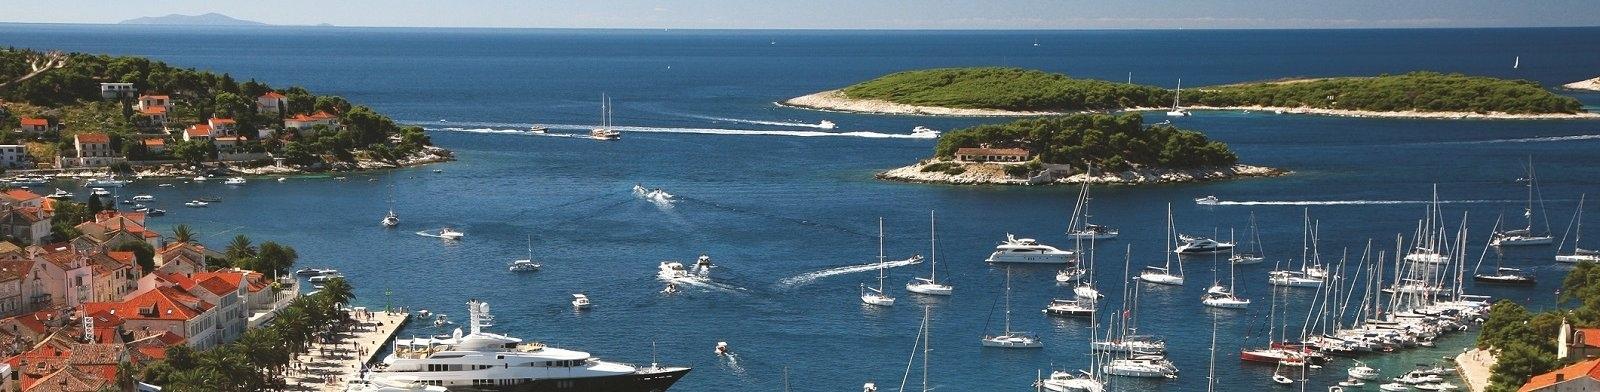 Hvar Island harbour view